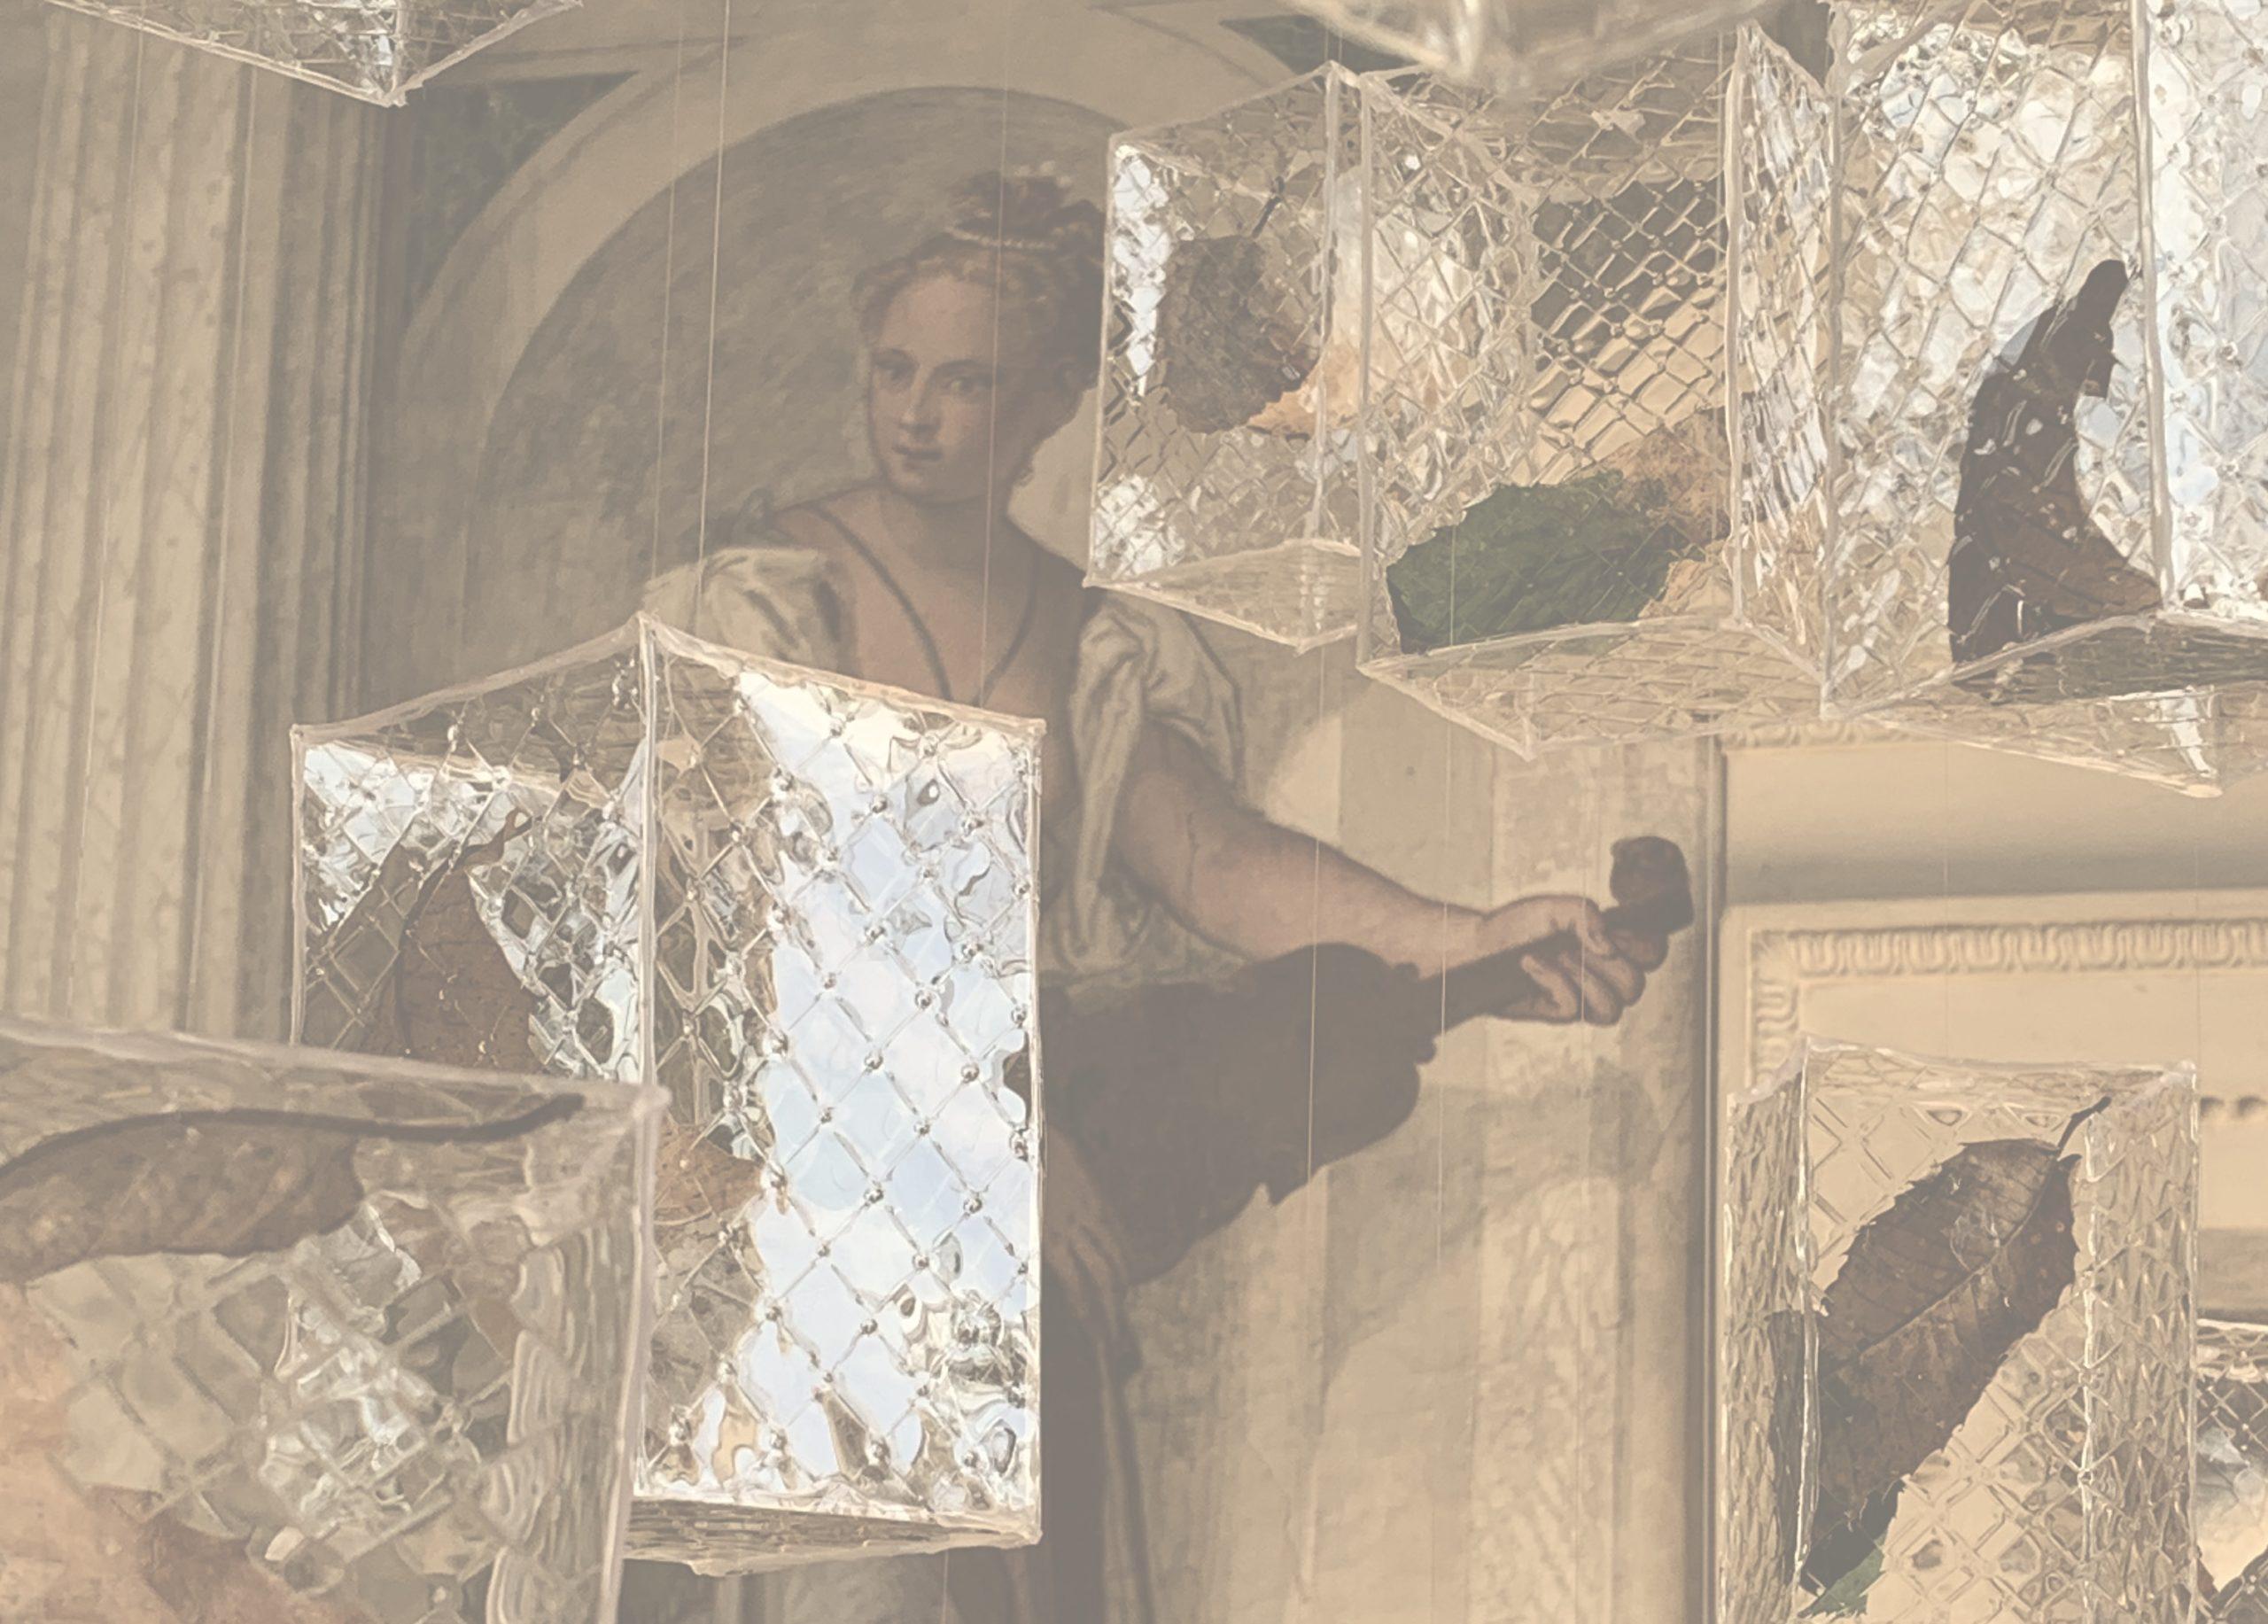 chicco margaroli arte – 03